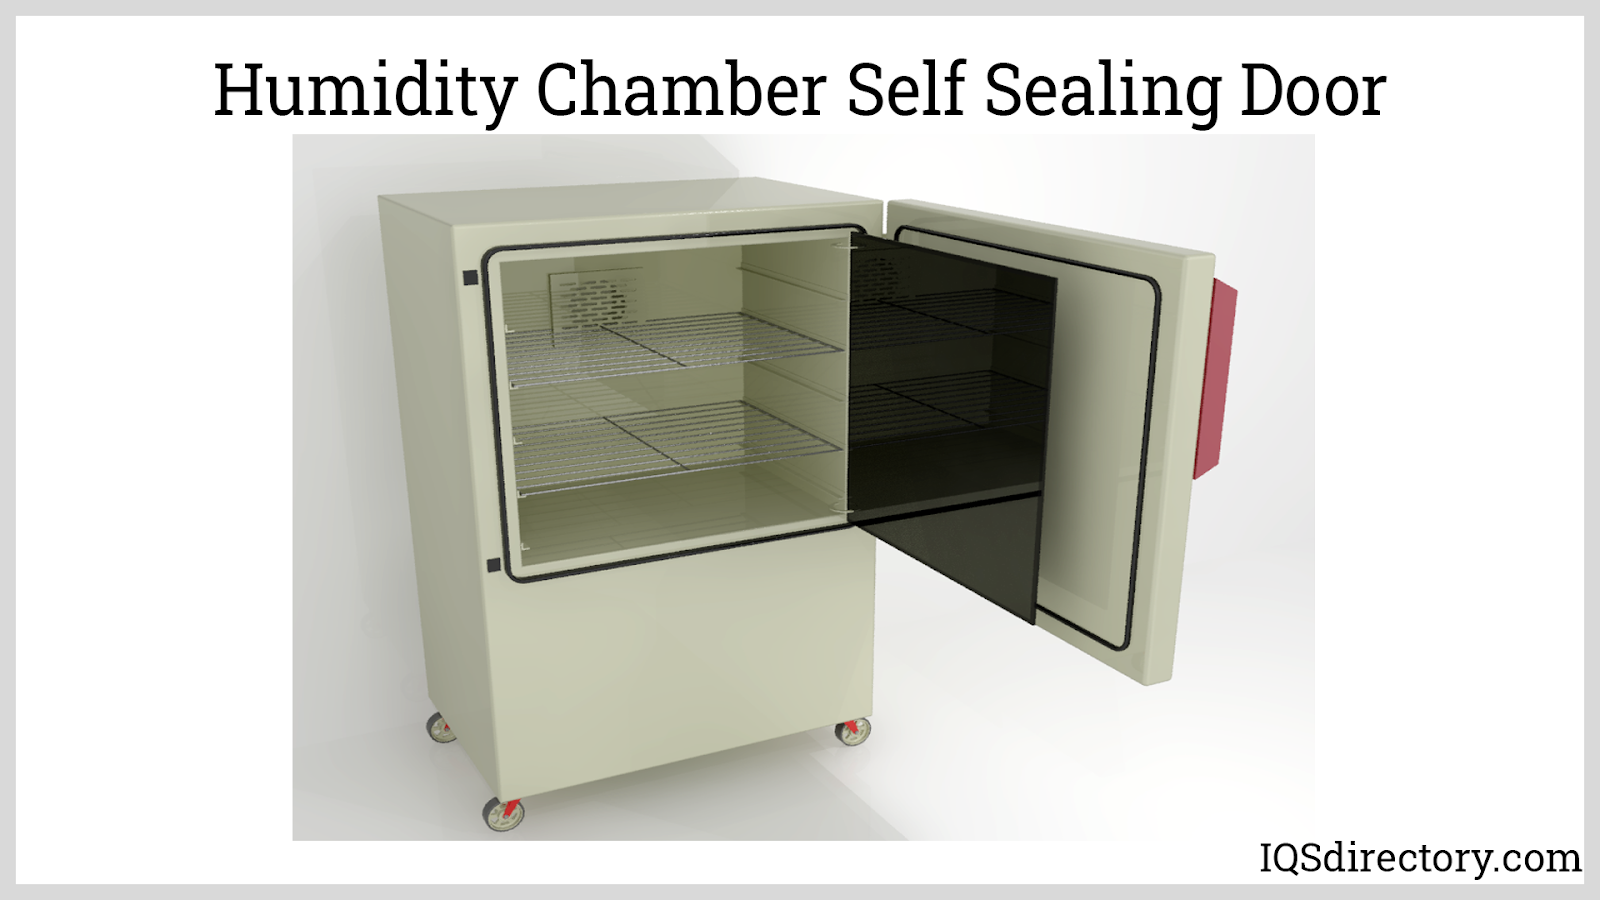 Humidity Chamber Self Sealing Door